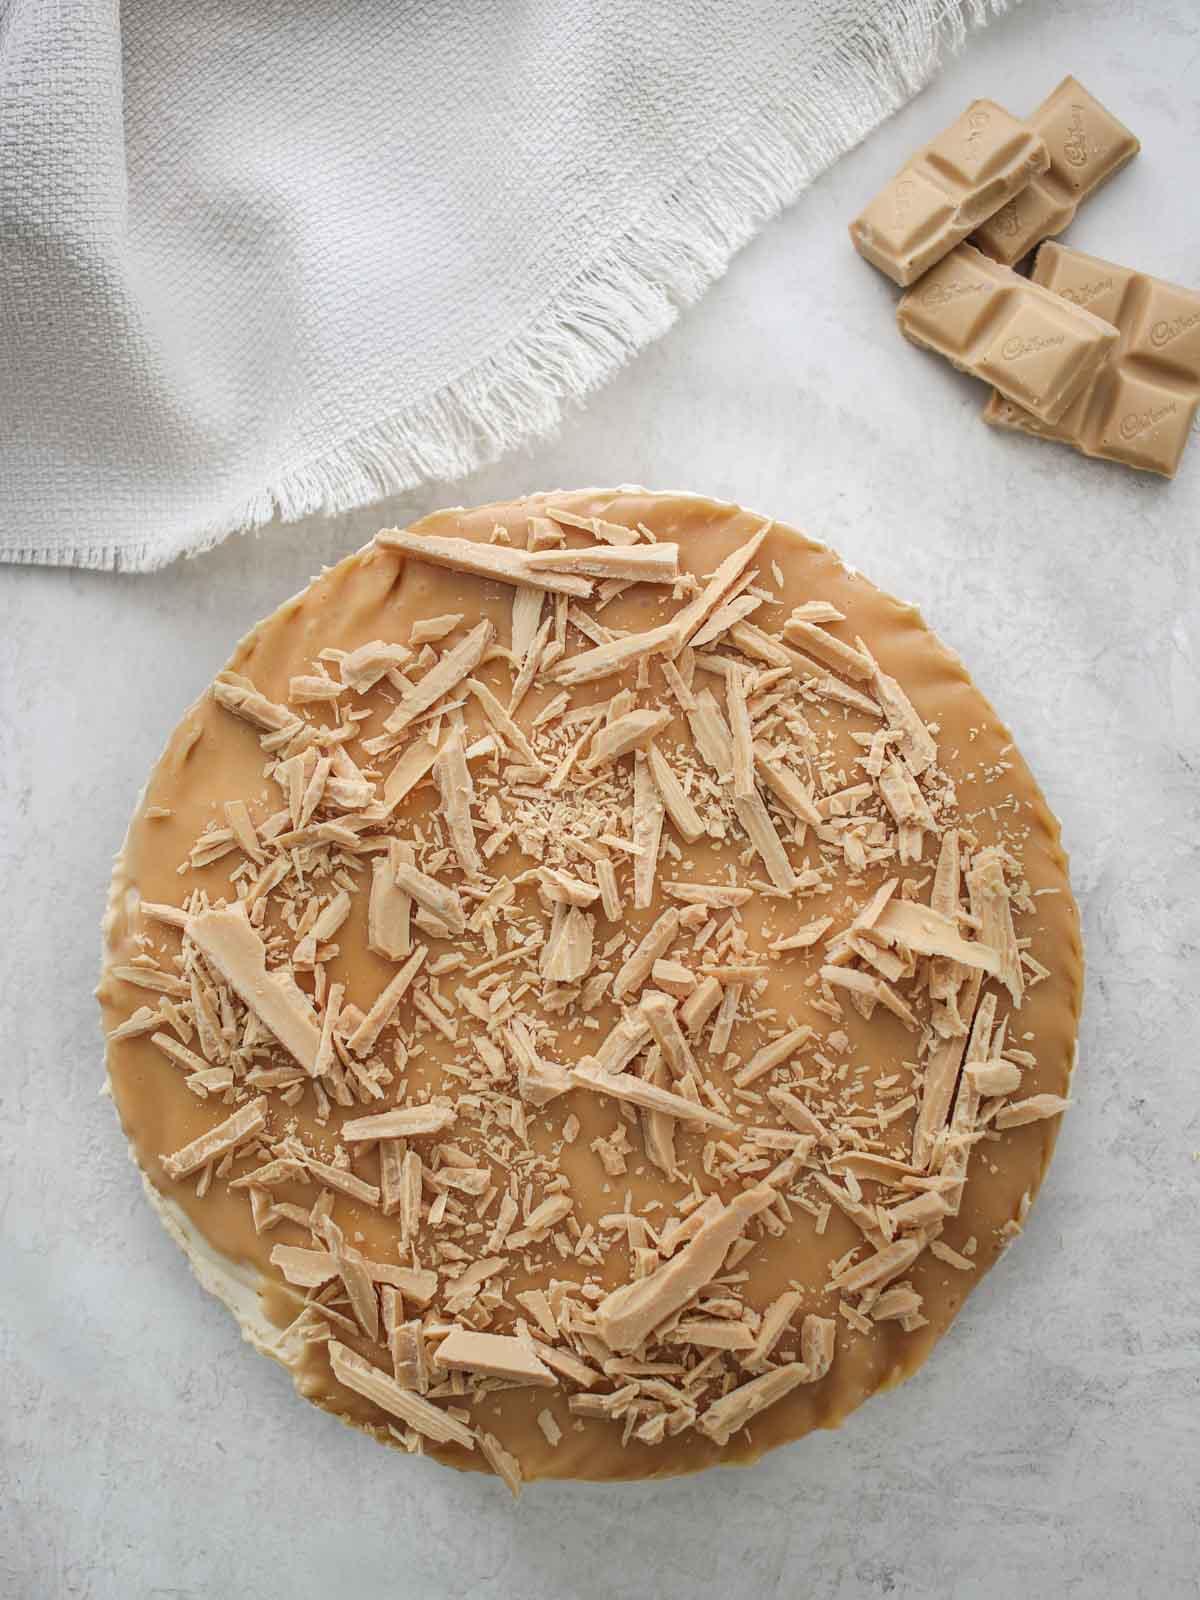 Caramilk Cheesecake Recipe